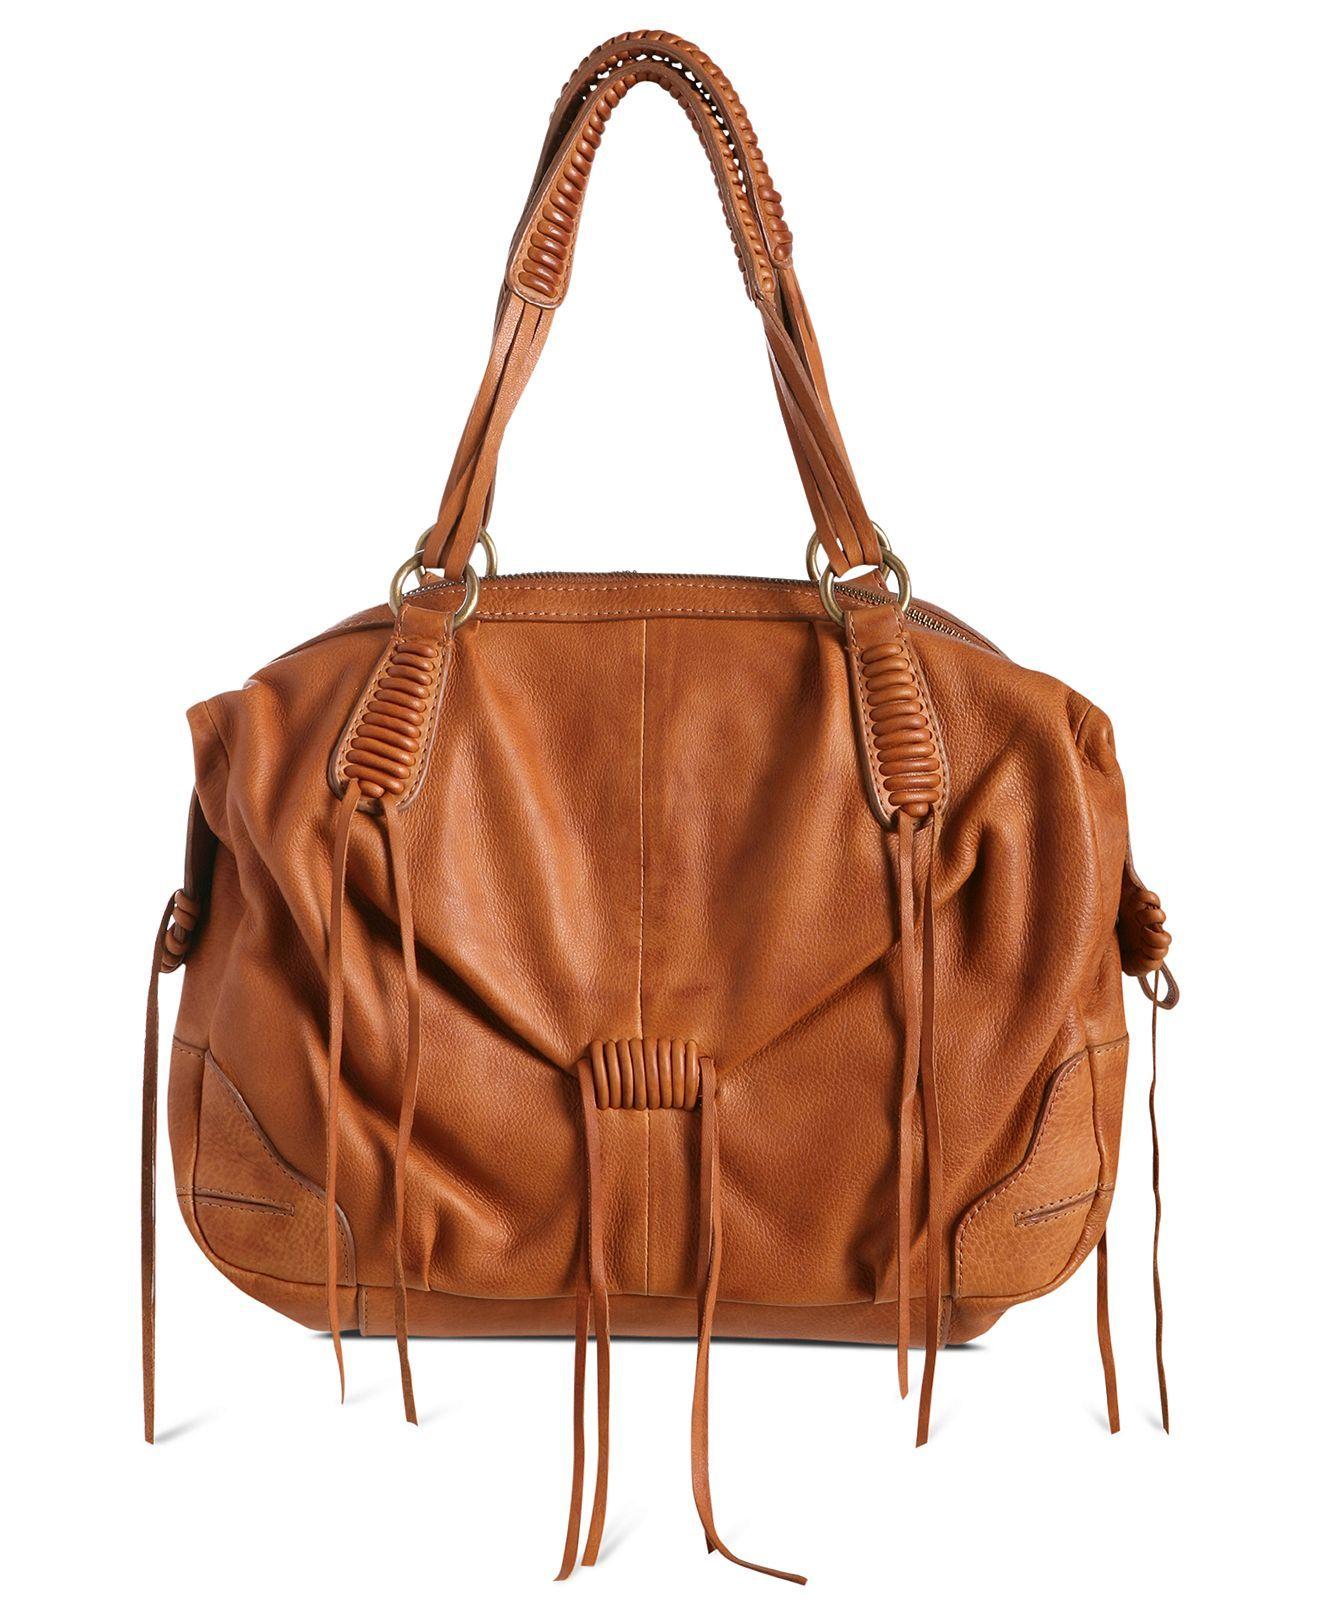 Lucky Brand Handbag Jordana Satchel Handbags Accessories Macy S